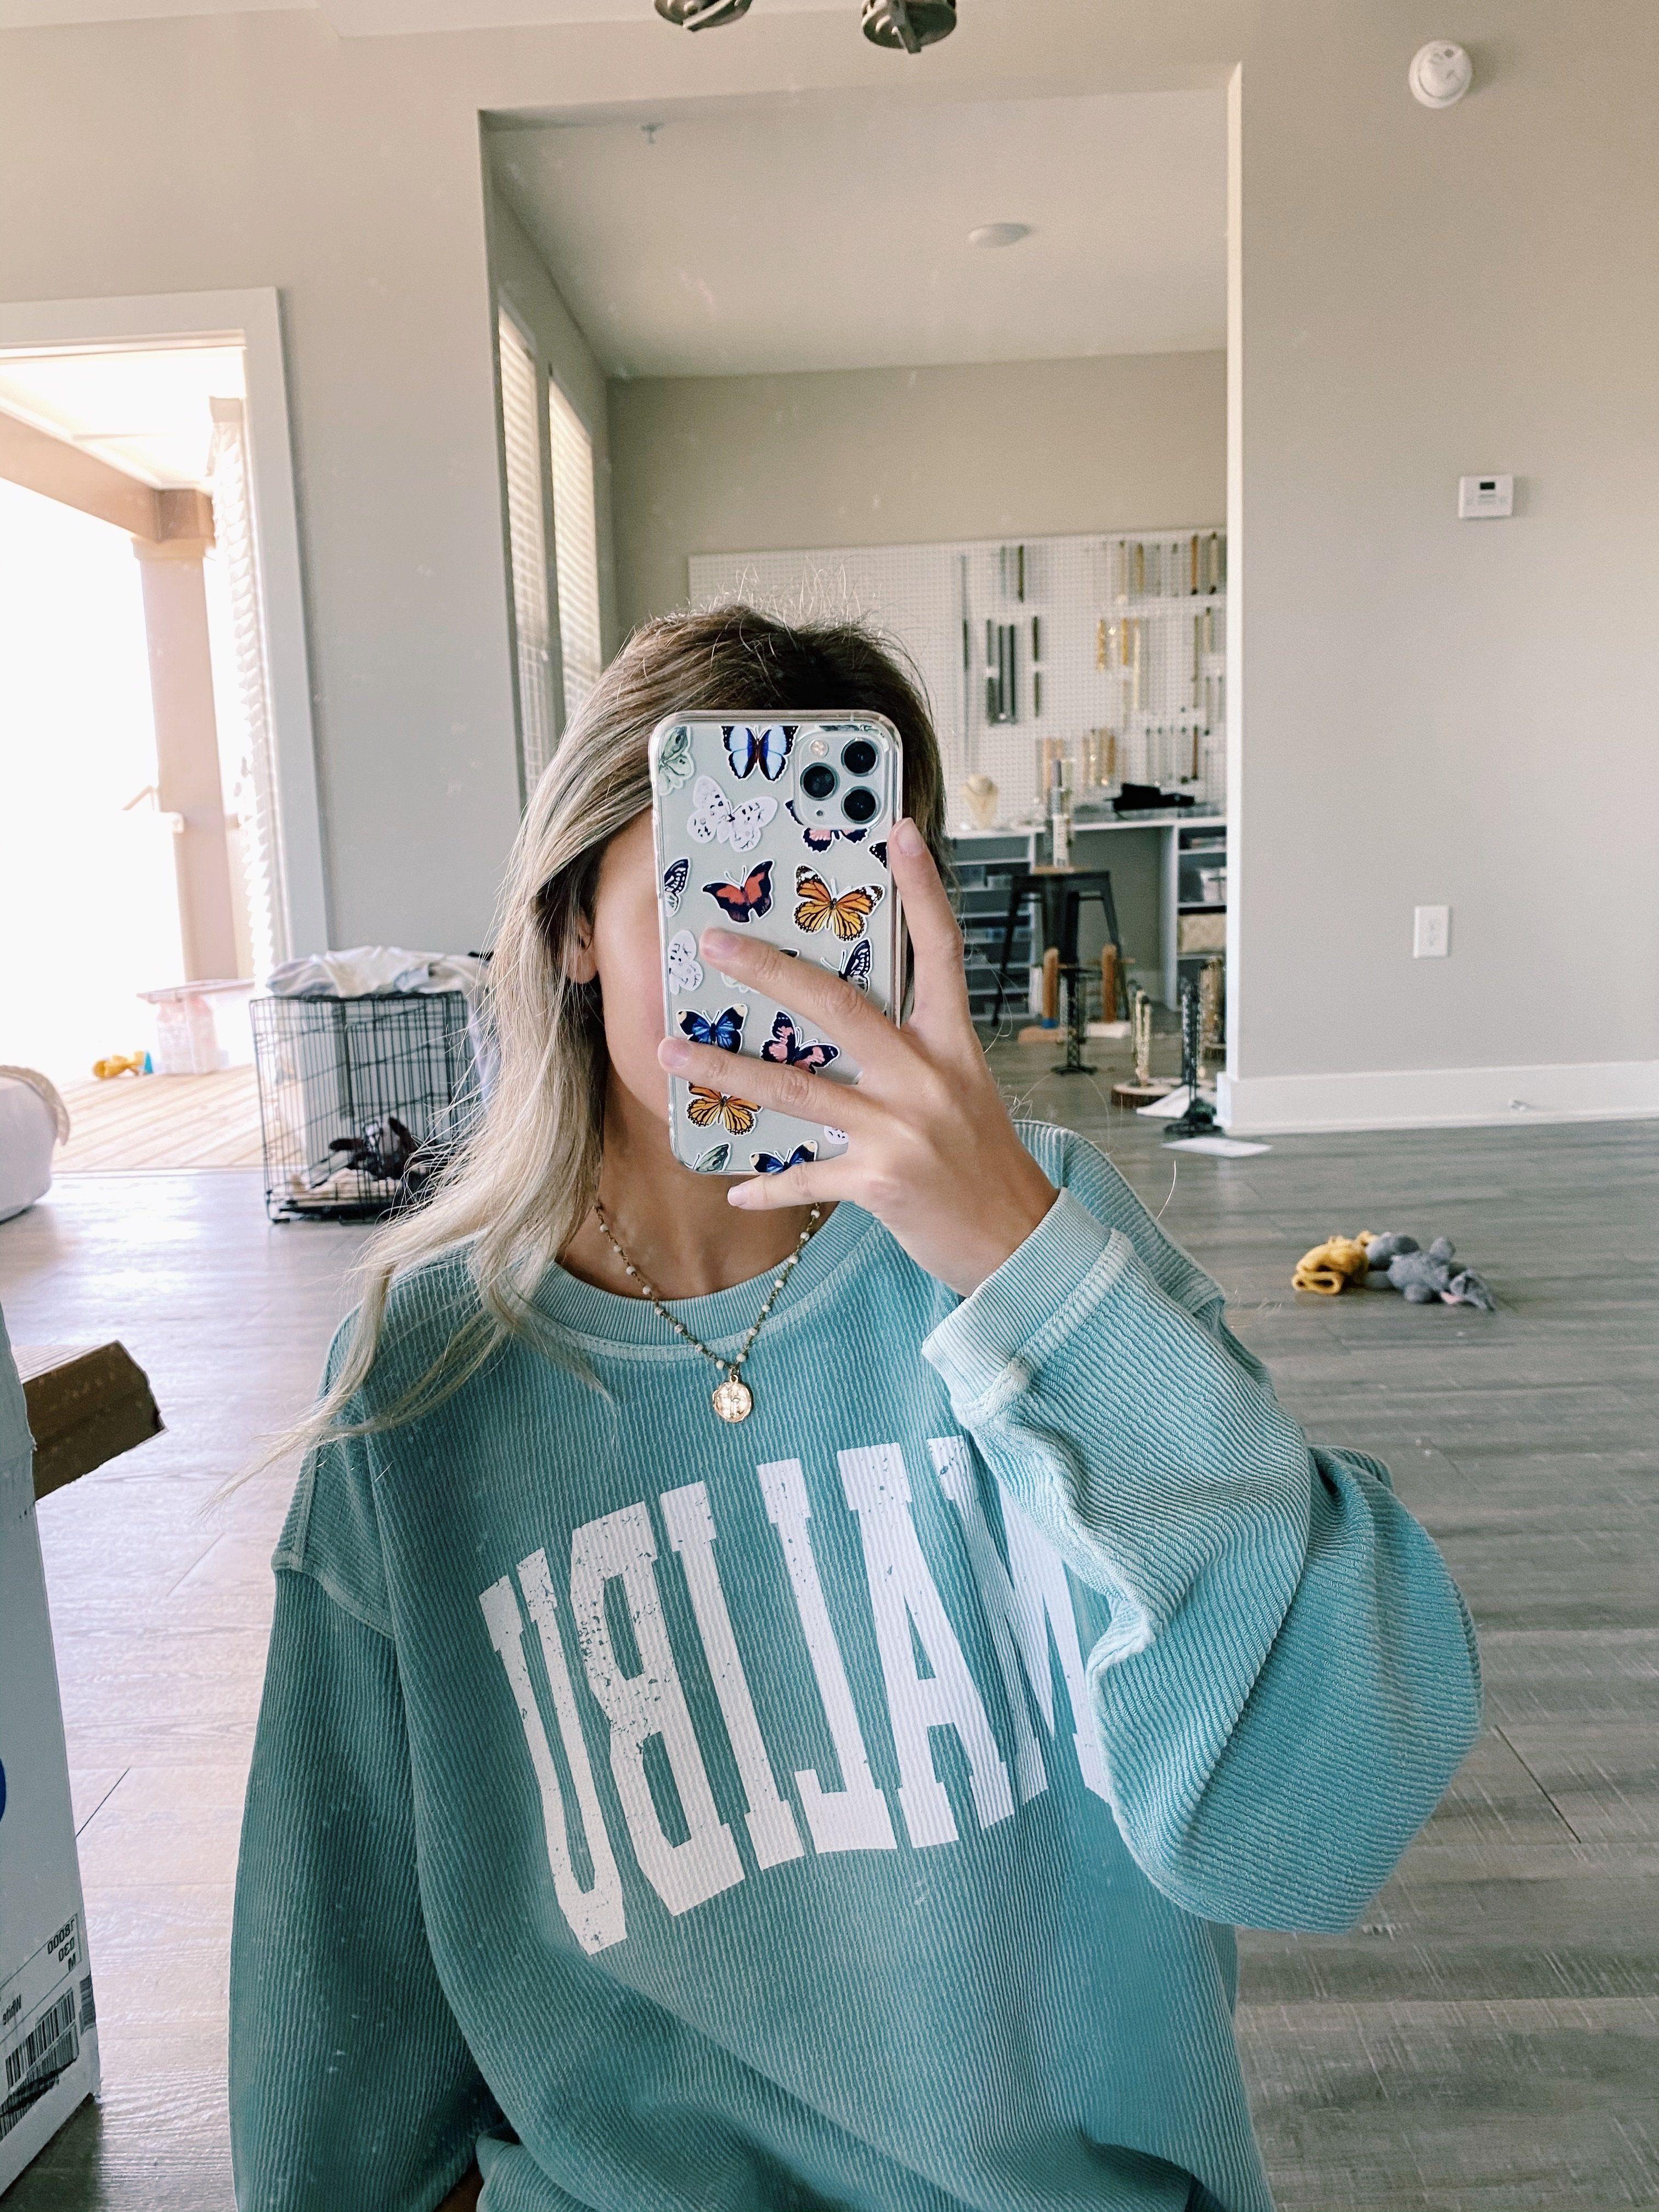 Malibu Corded Sweatshirt Medium Sweatshirts Oversized Sweatshirt Outfit Cute Lazy Outfits [ 4032 x 3024 Pixel ]